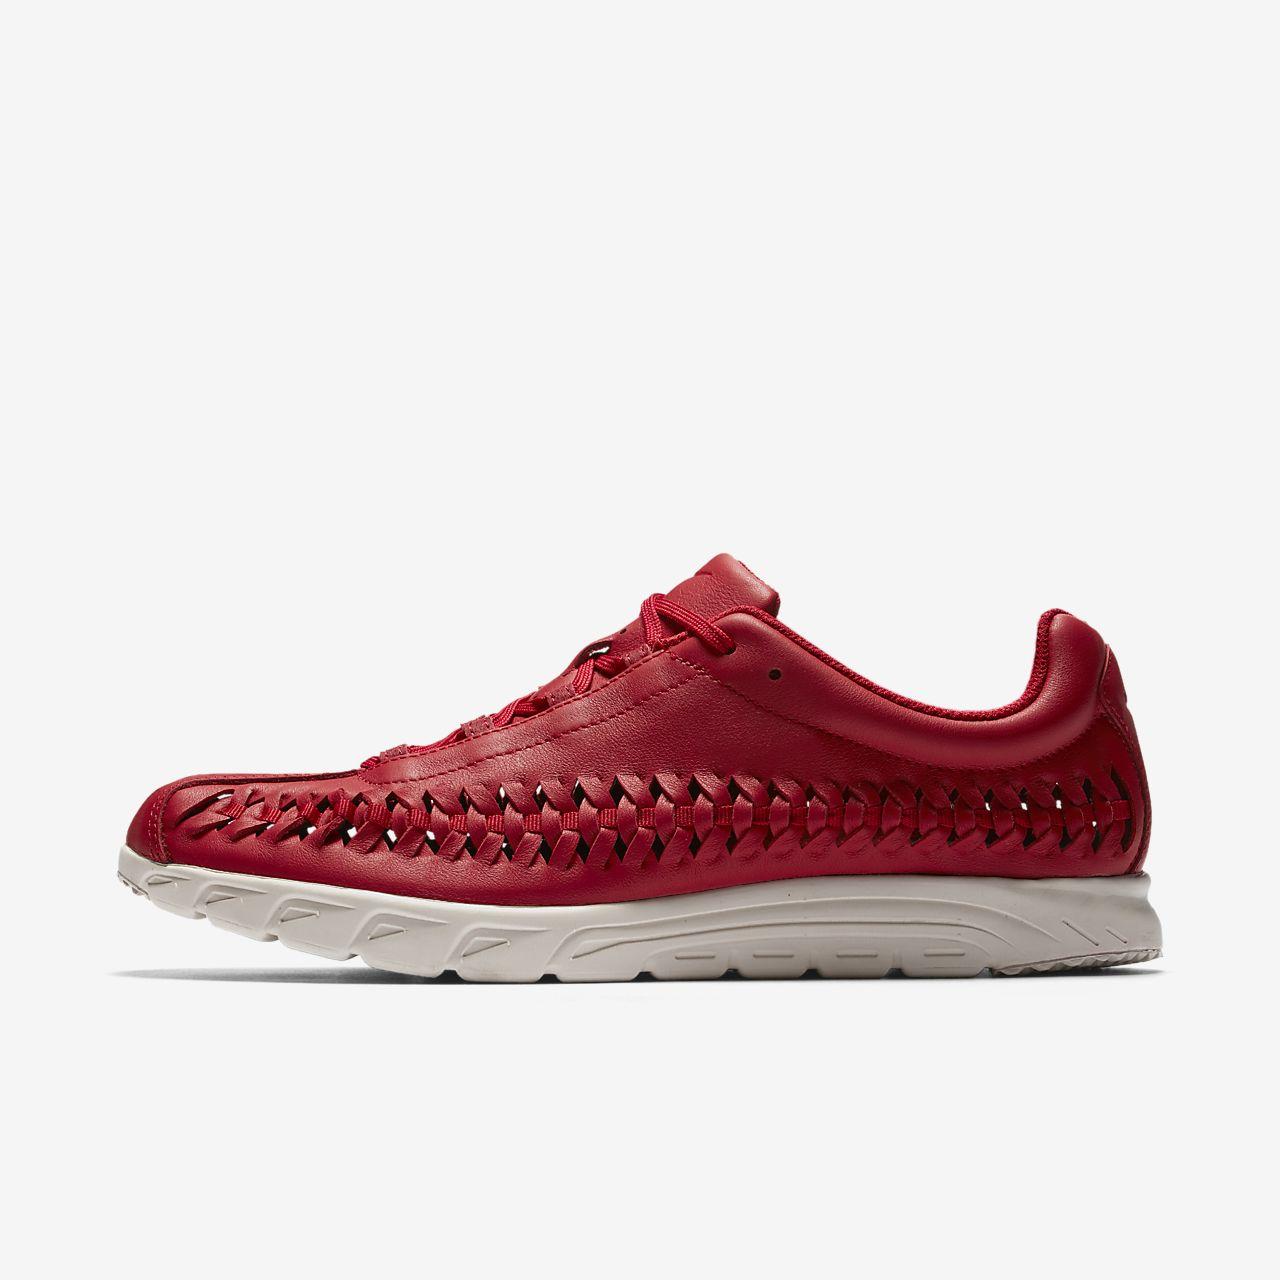 Chaussure Mayfly Woven Pour HommeLu Nike xtsQdrhC